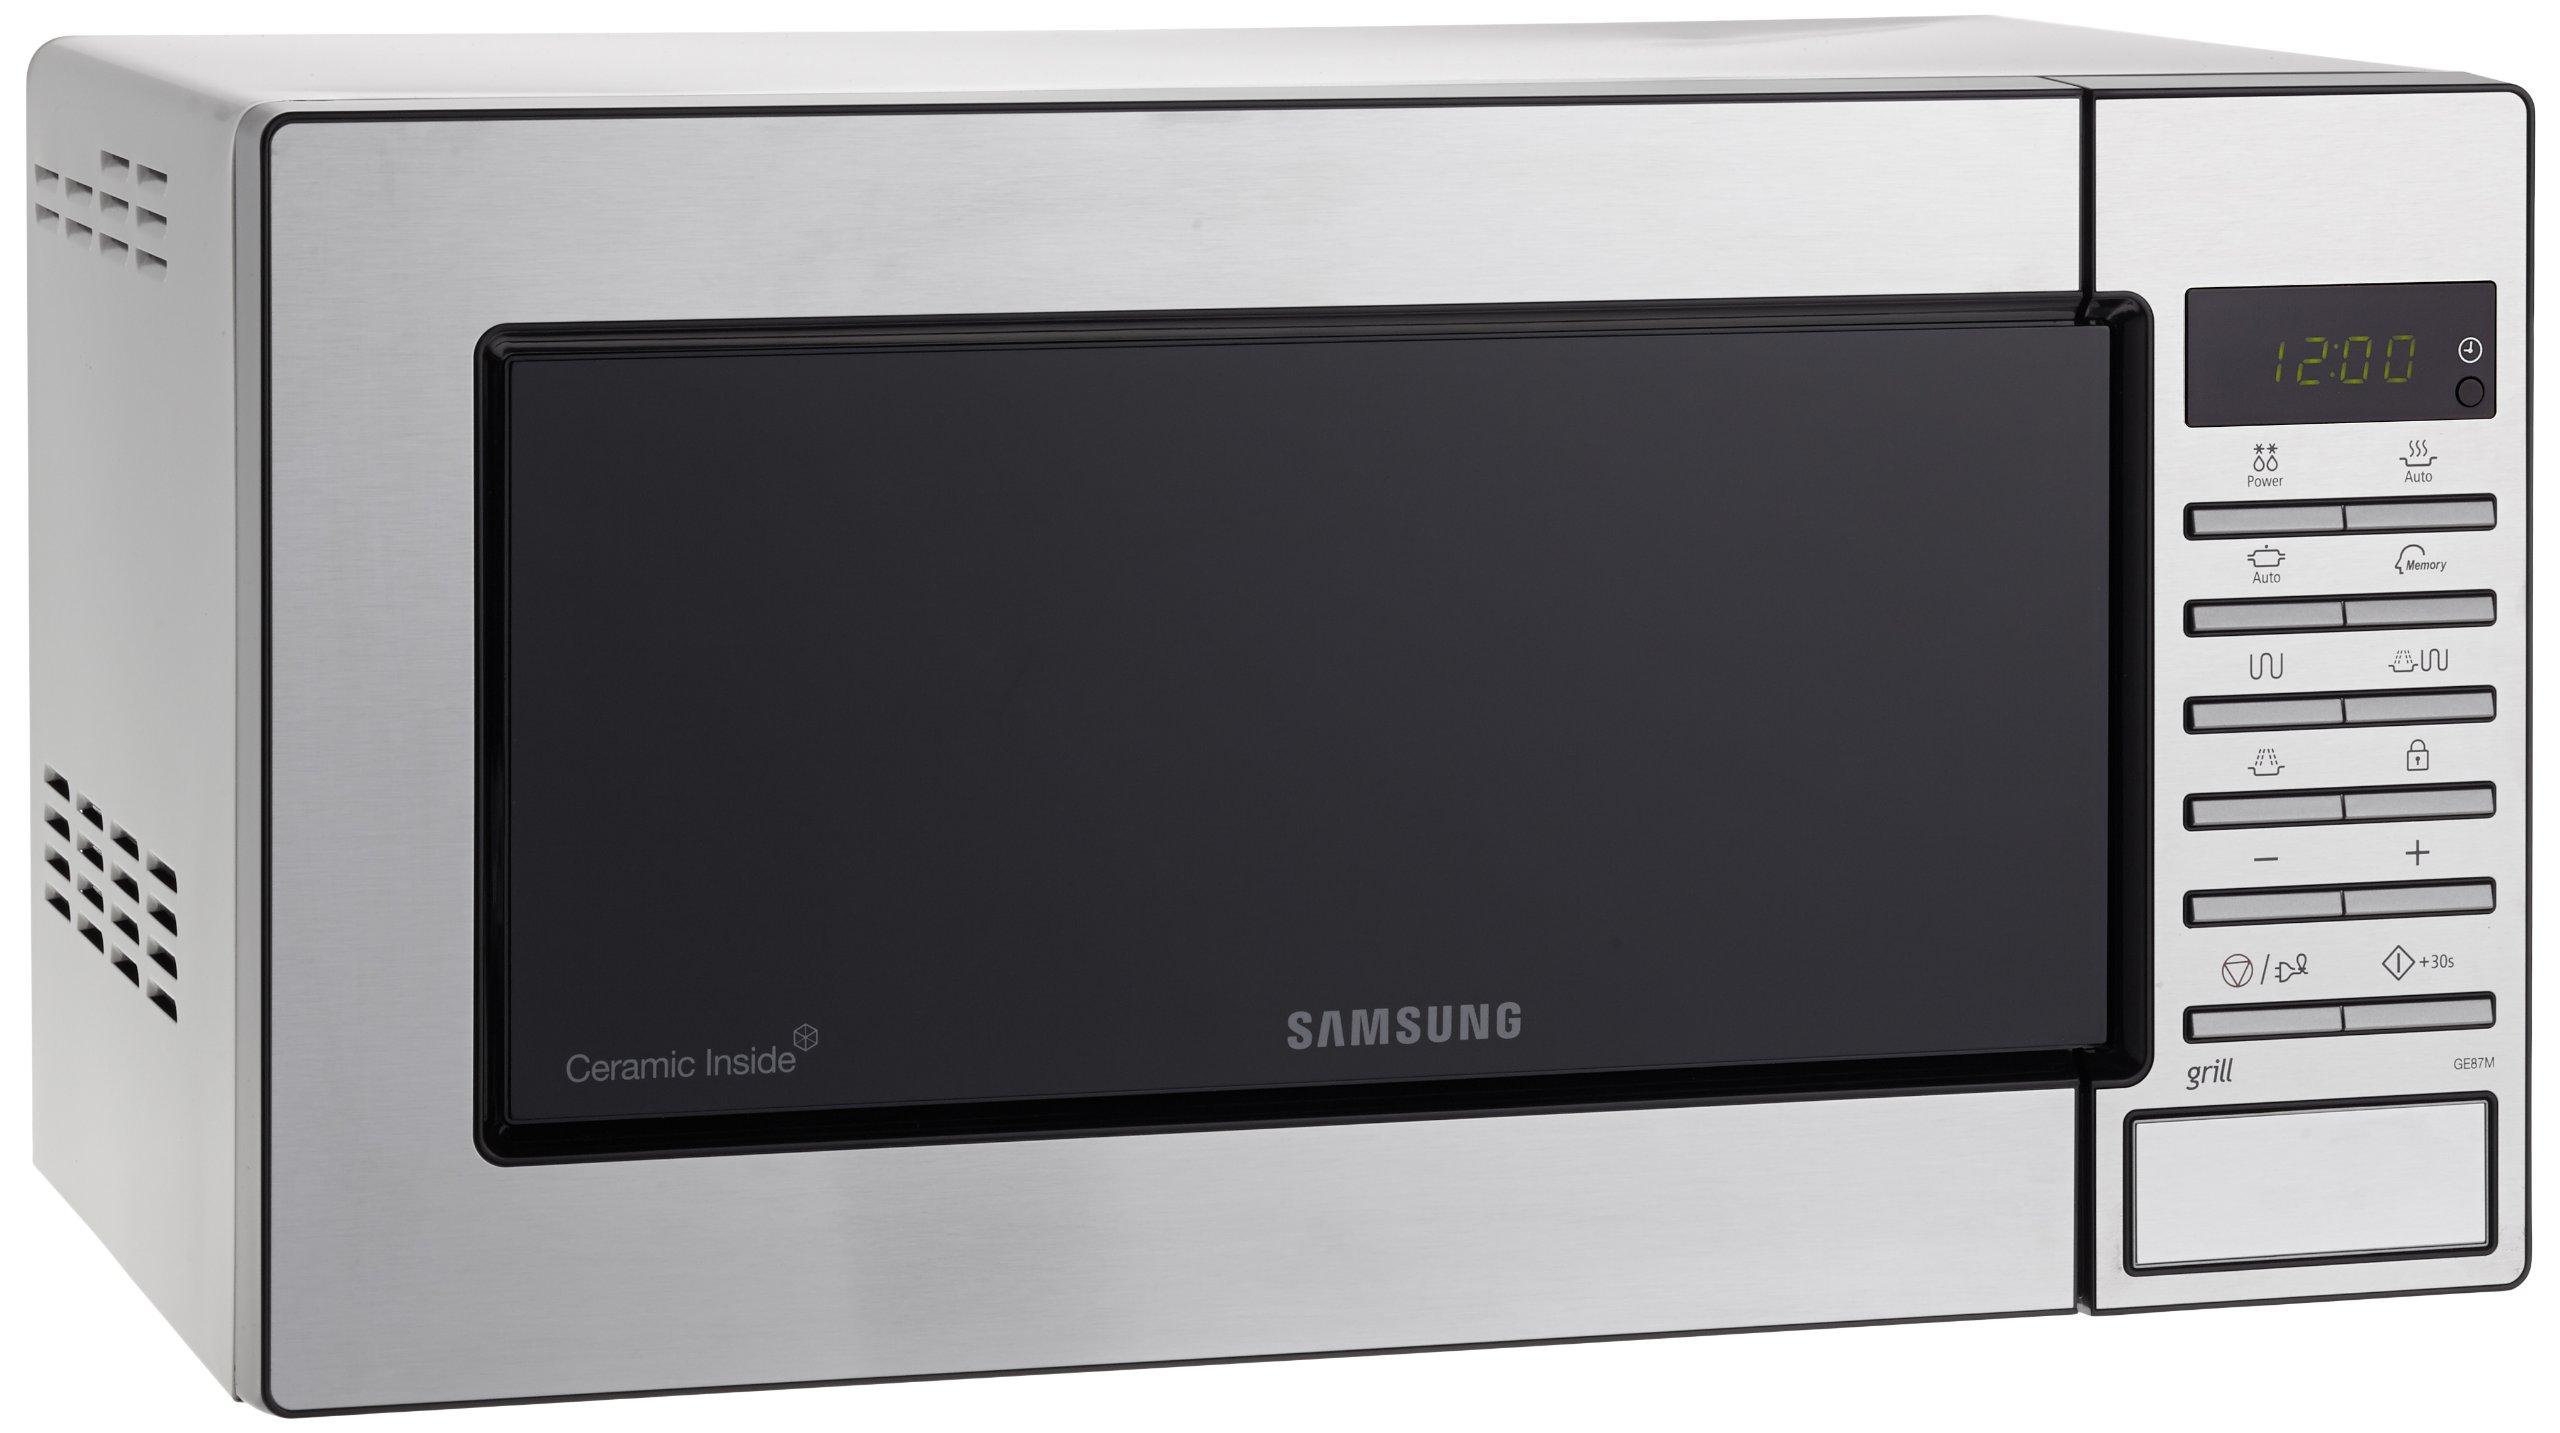 Samsung GE87M-X/XEC - Microondas con grill, 23 litros, 800 W, interior cerámico, color gris product image